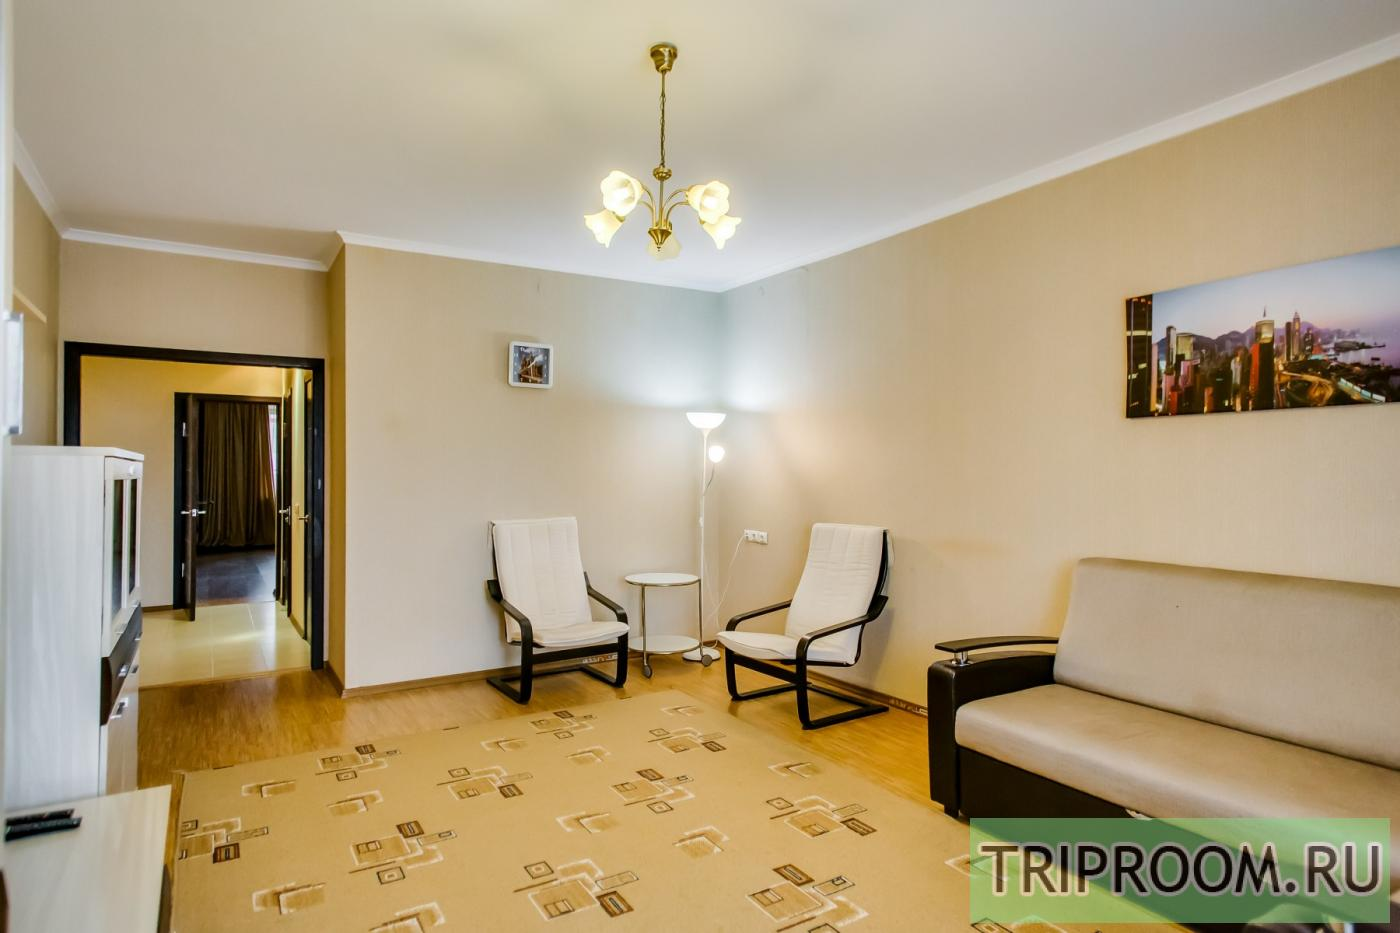 2-комнатная квартира посуточно (вариант № 23730), ул. Максима Горького улица, фото № 5